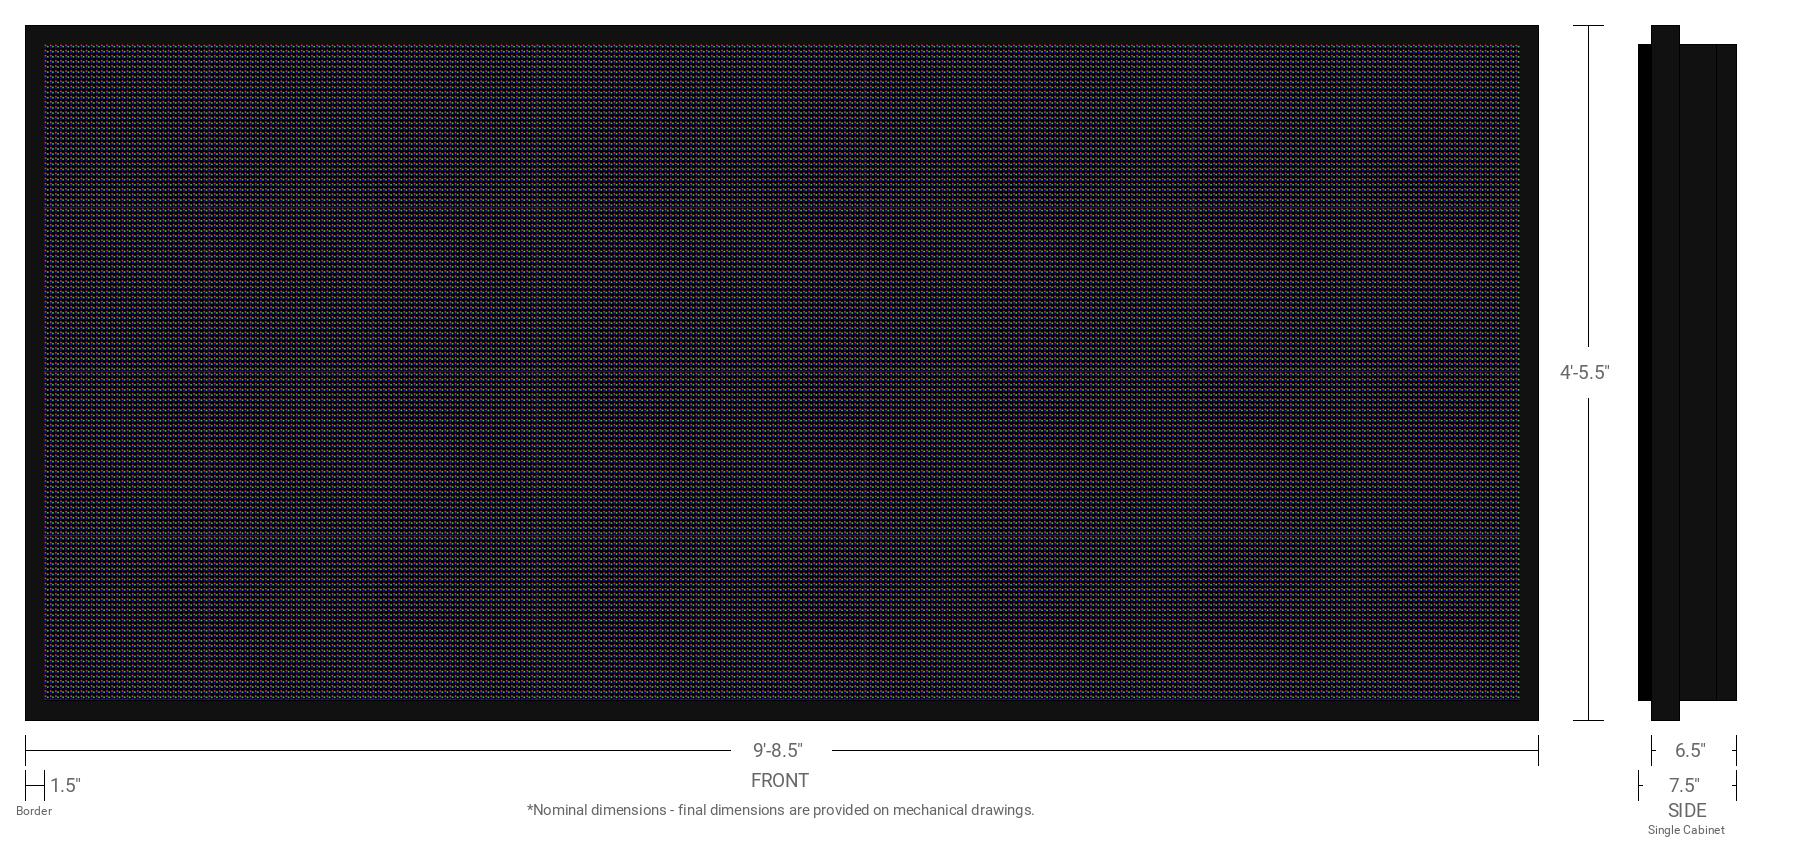 Polaris 10mm 128x288 Single Sided Full Color LED Display